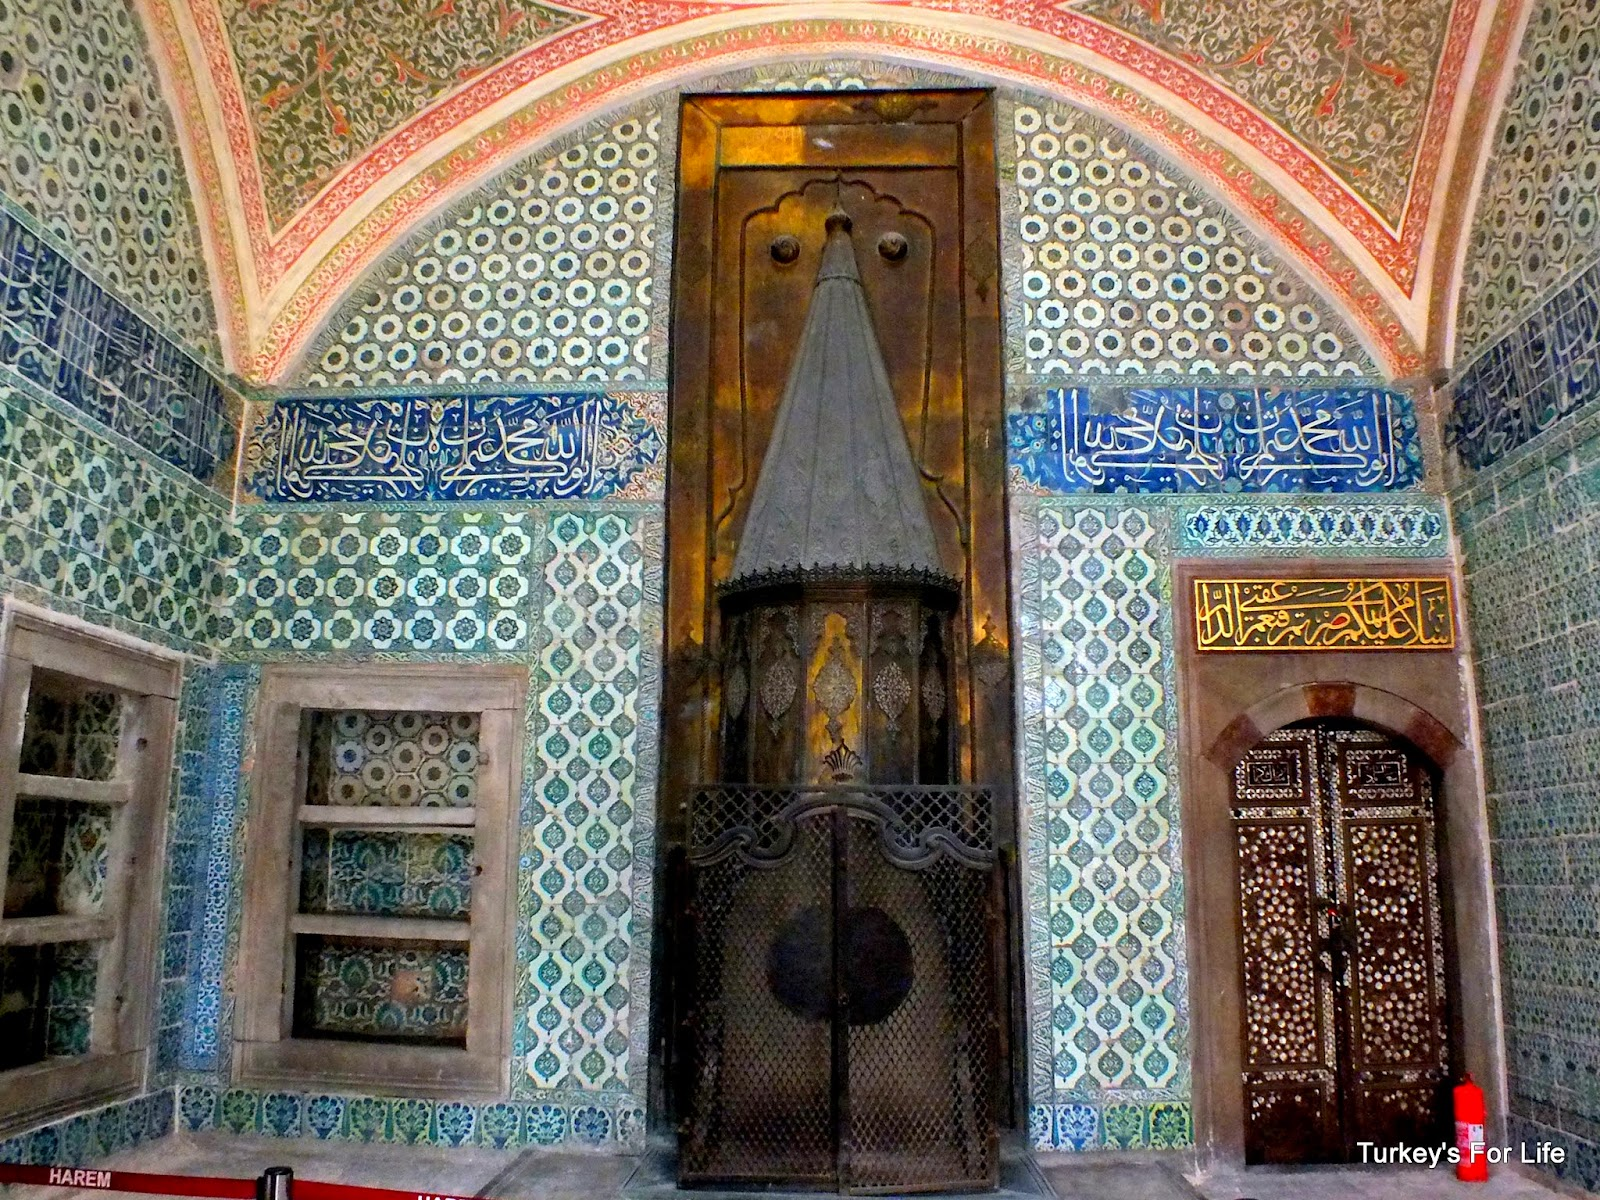 Harem Rooms, Topkapı Palace, Istanbul